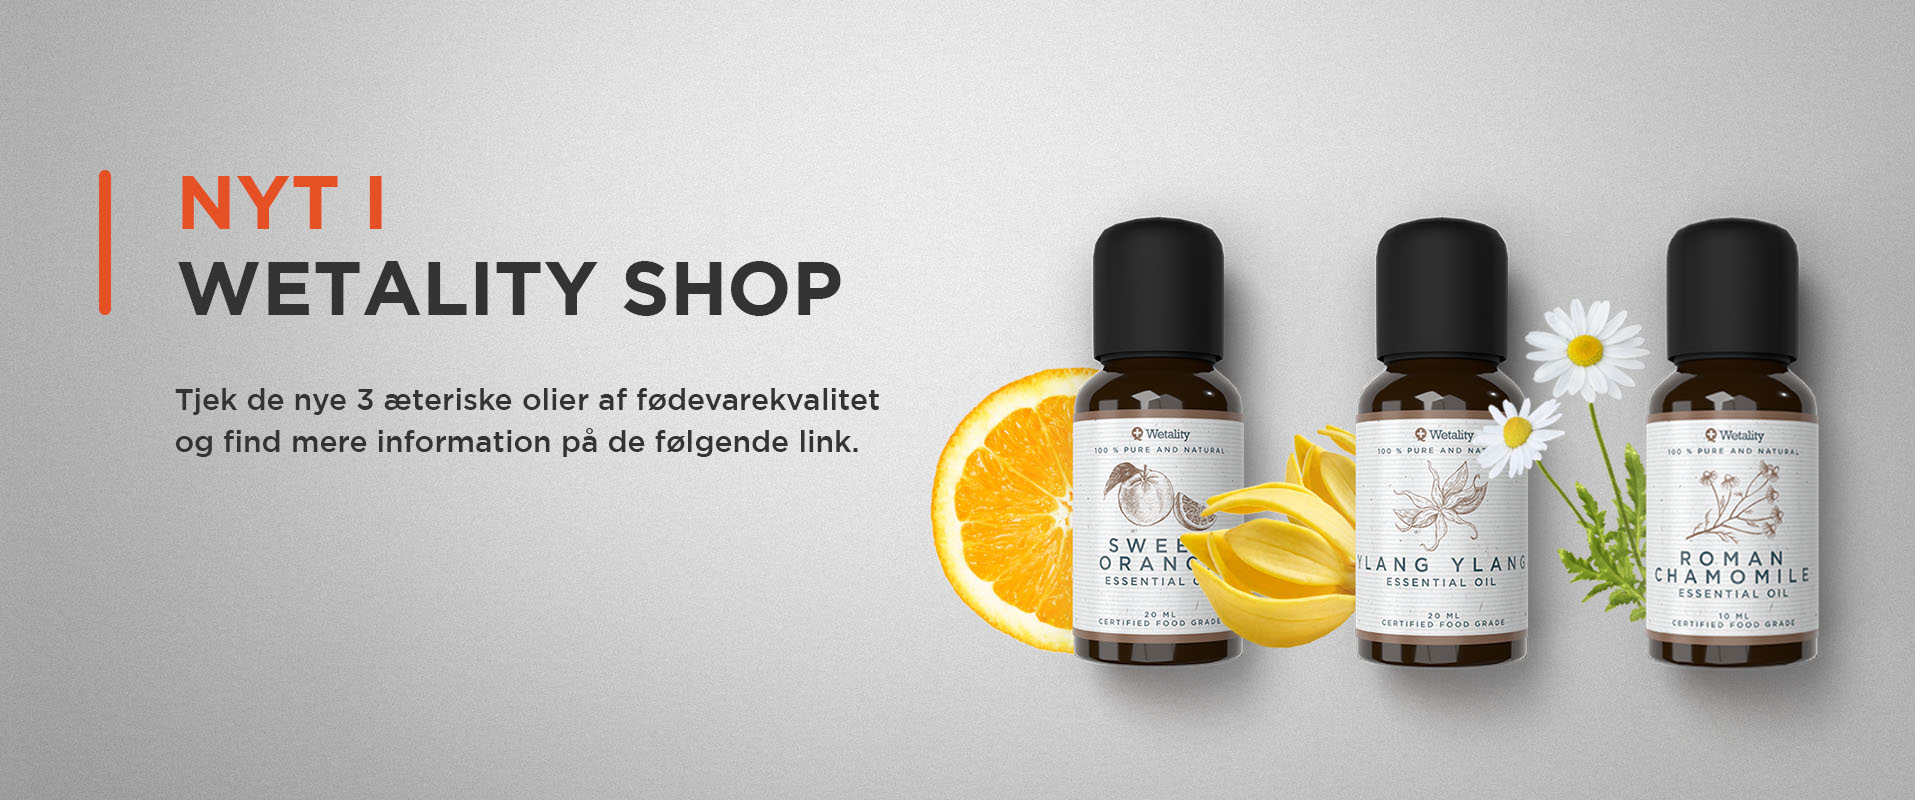 New essential oils